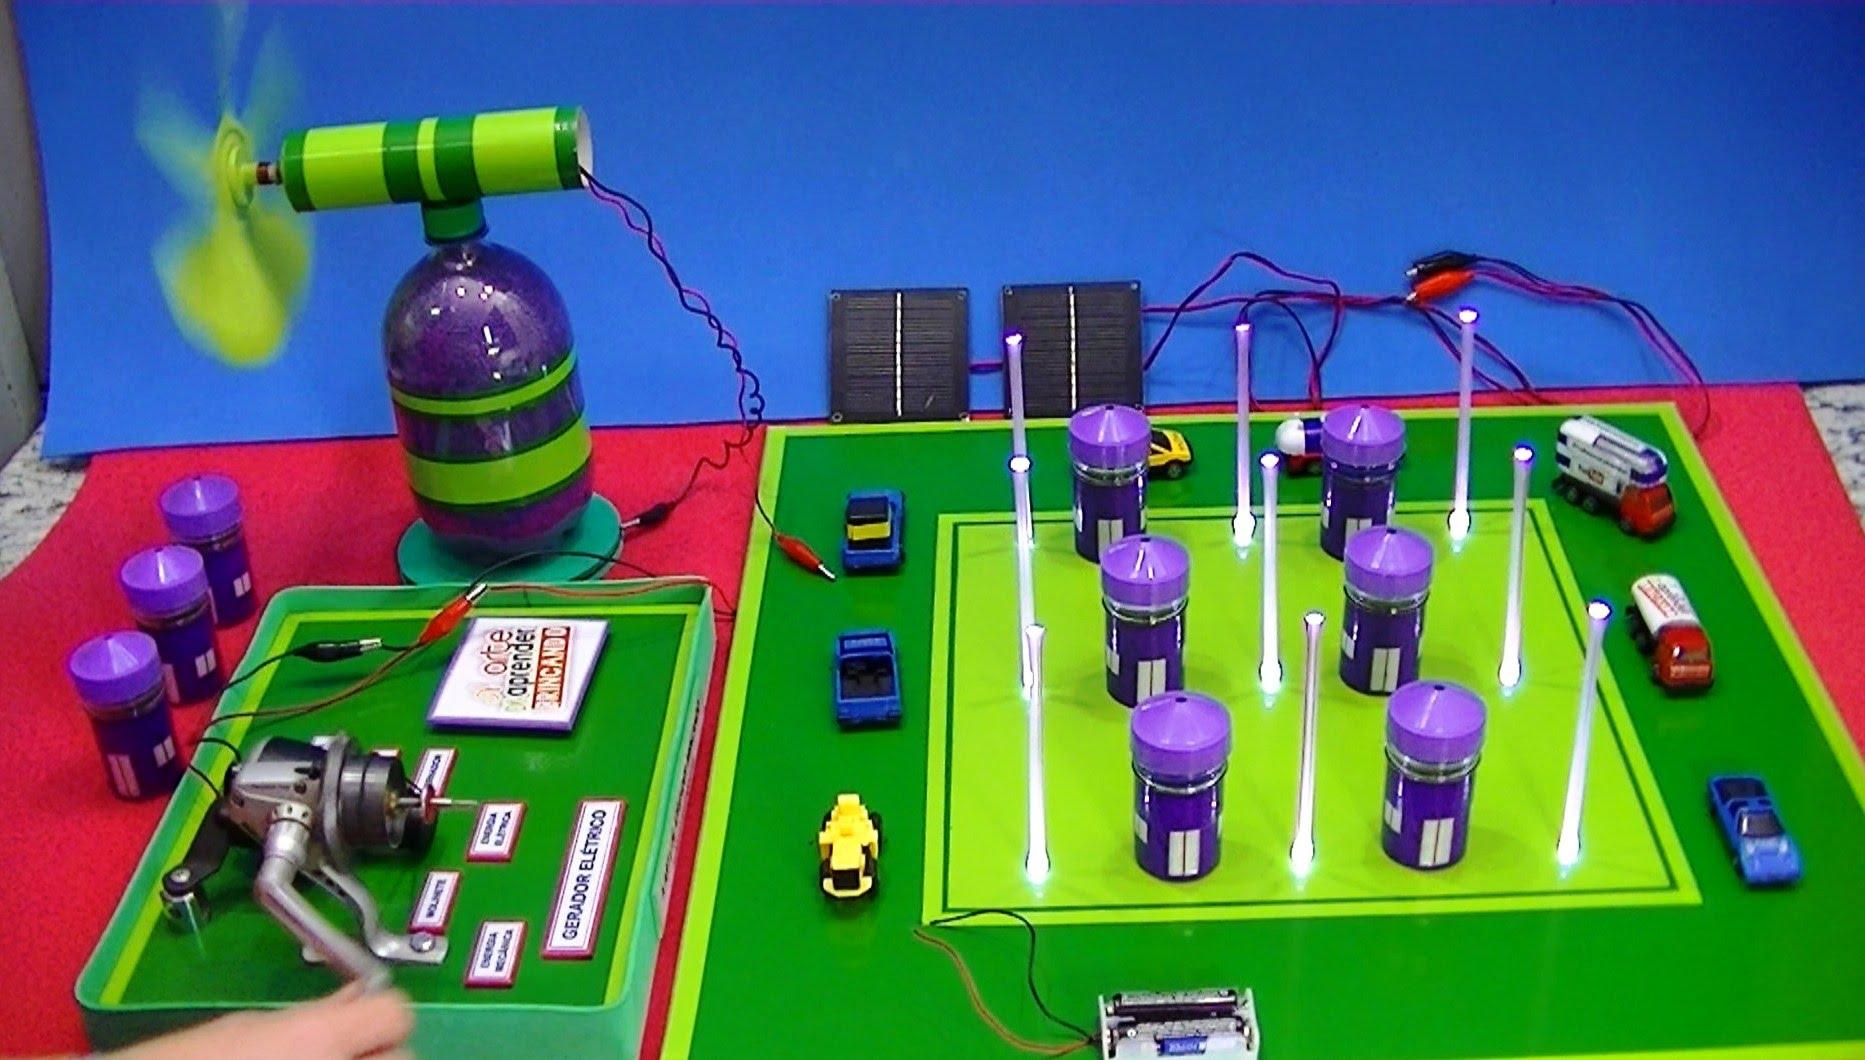 Maquete de cidade movida a energia eólica